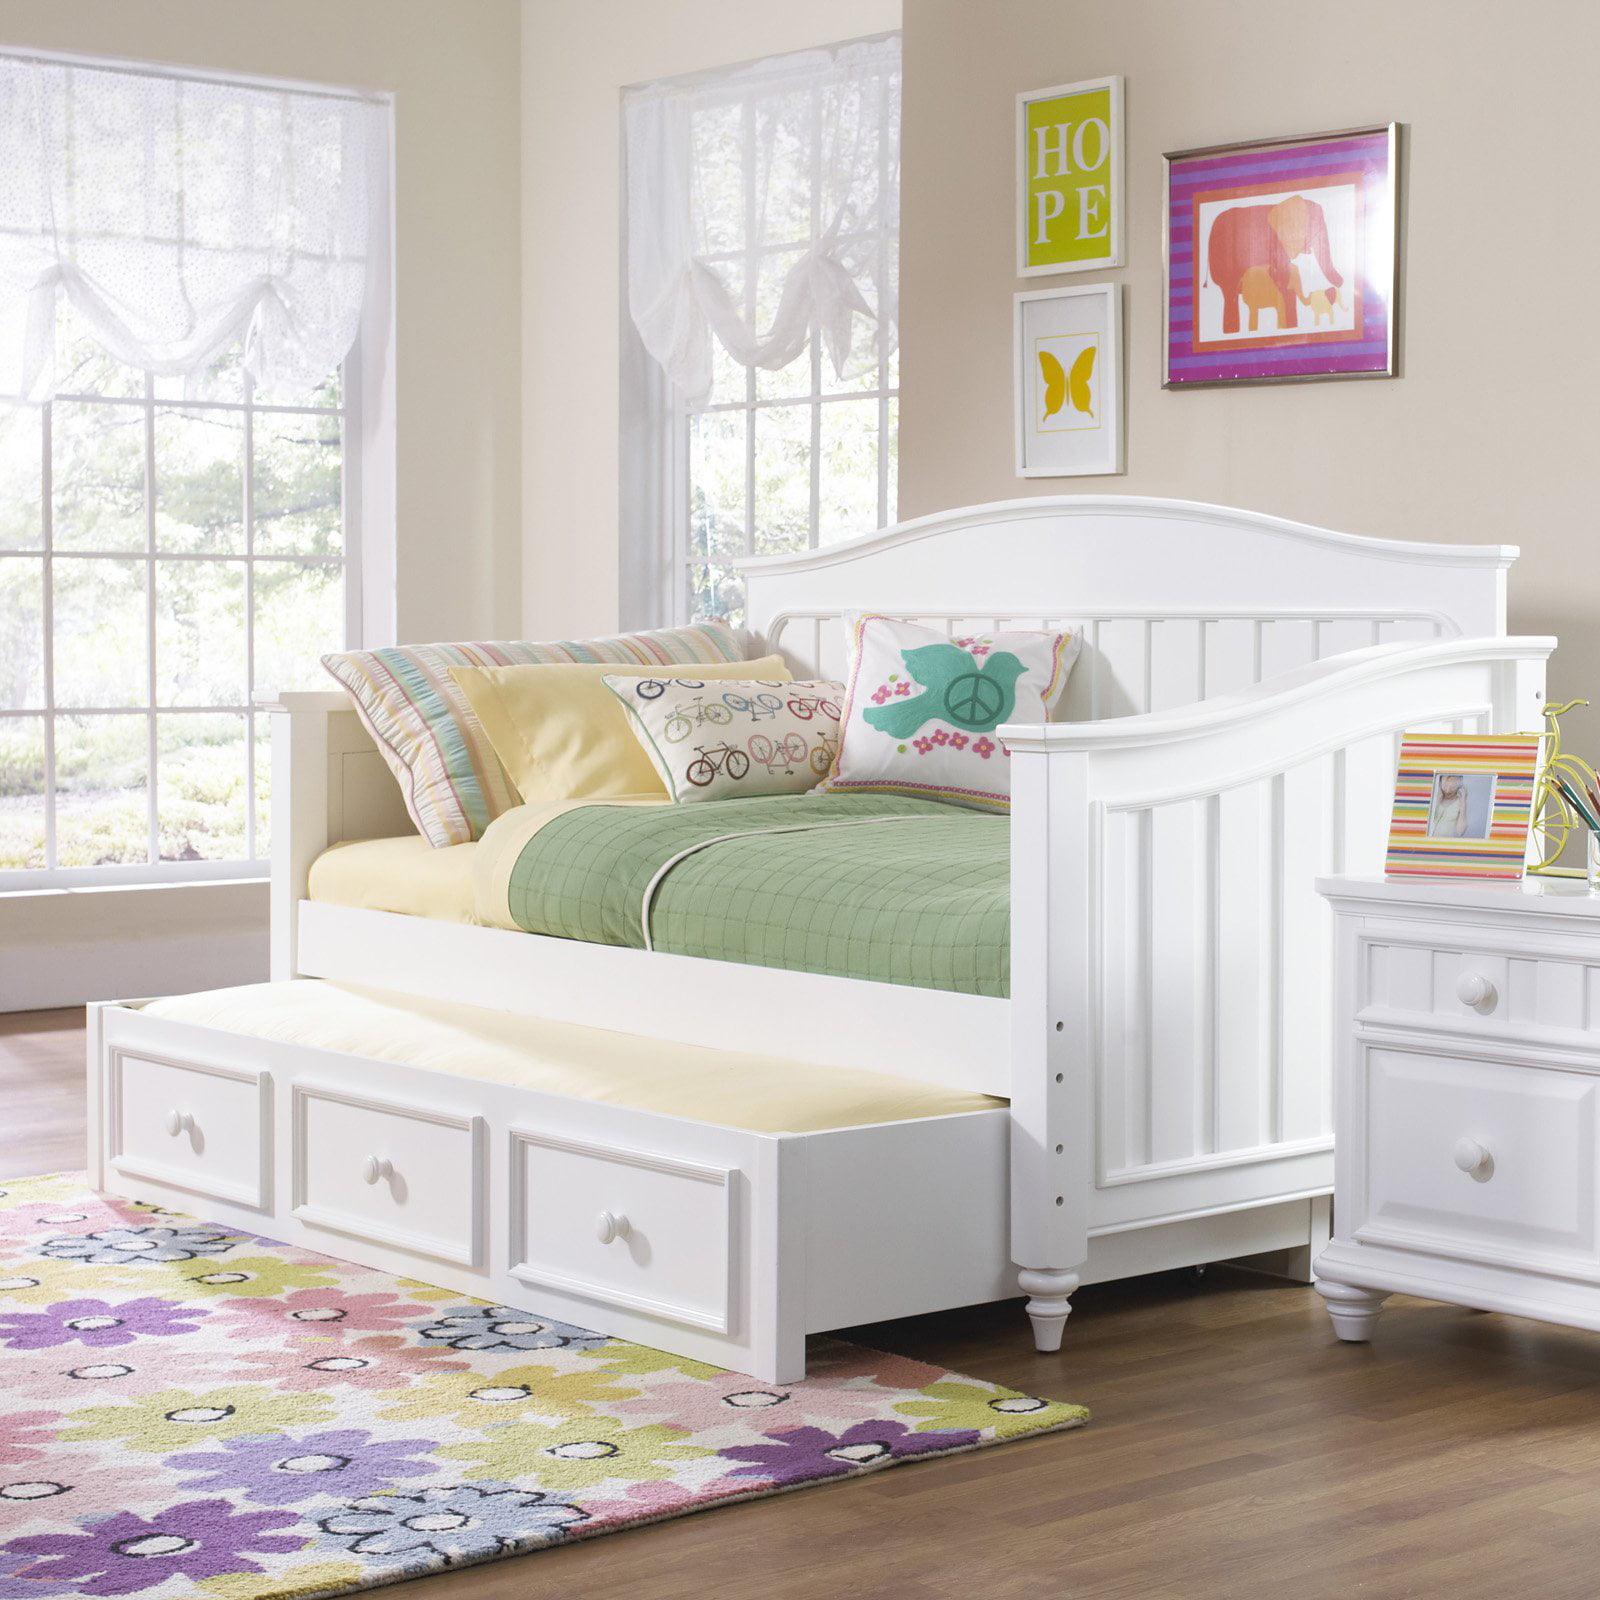 40 Beautiful Teenage Girls Bedroom Designs: SummerTime Daybed